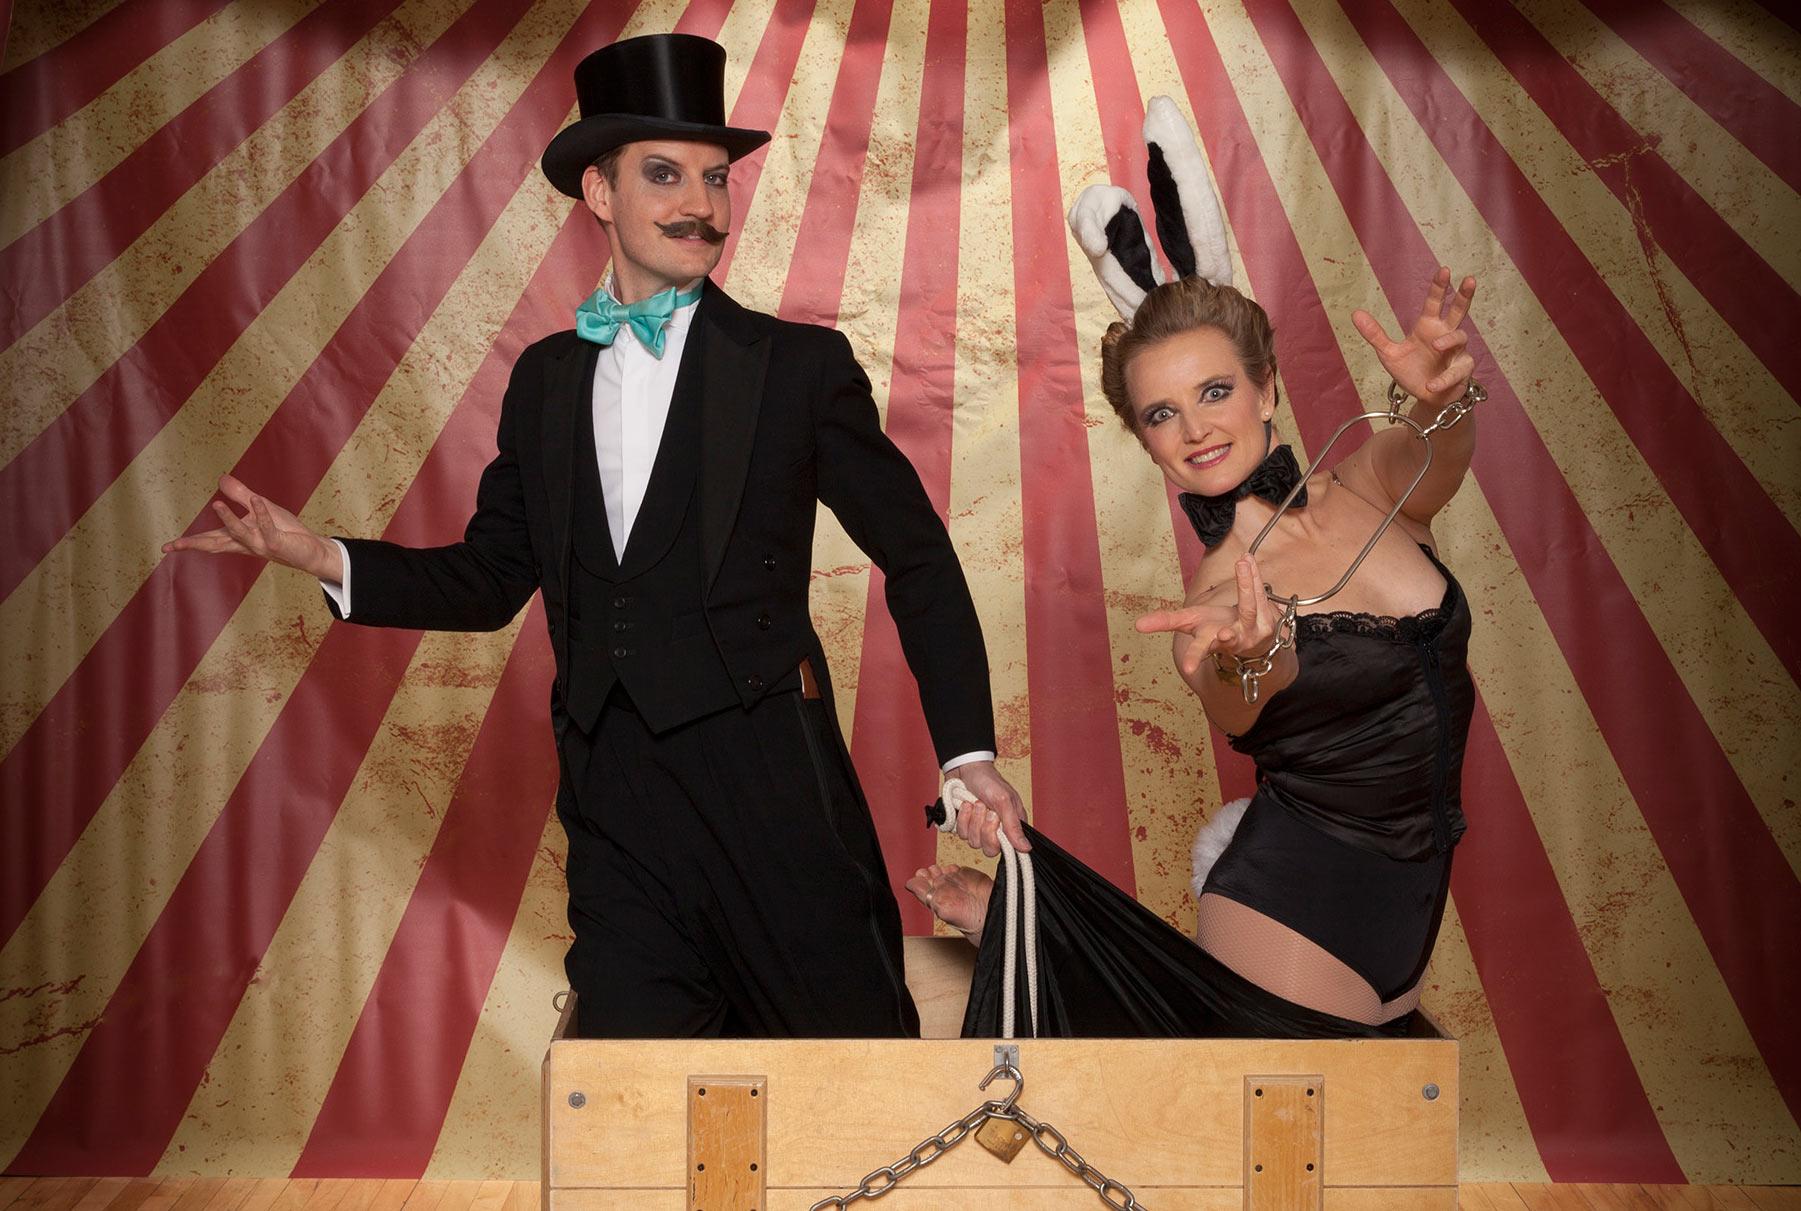 magic, show, assistant, rabbit, comedy, cabaret